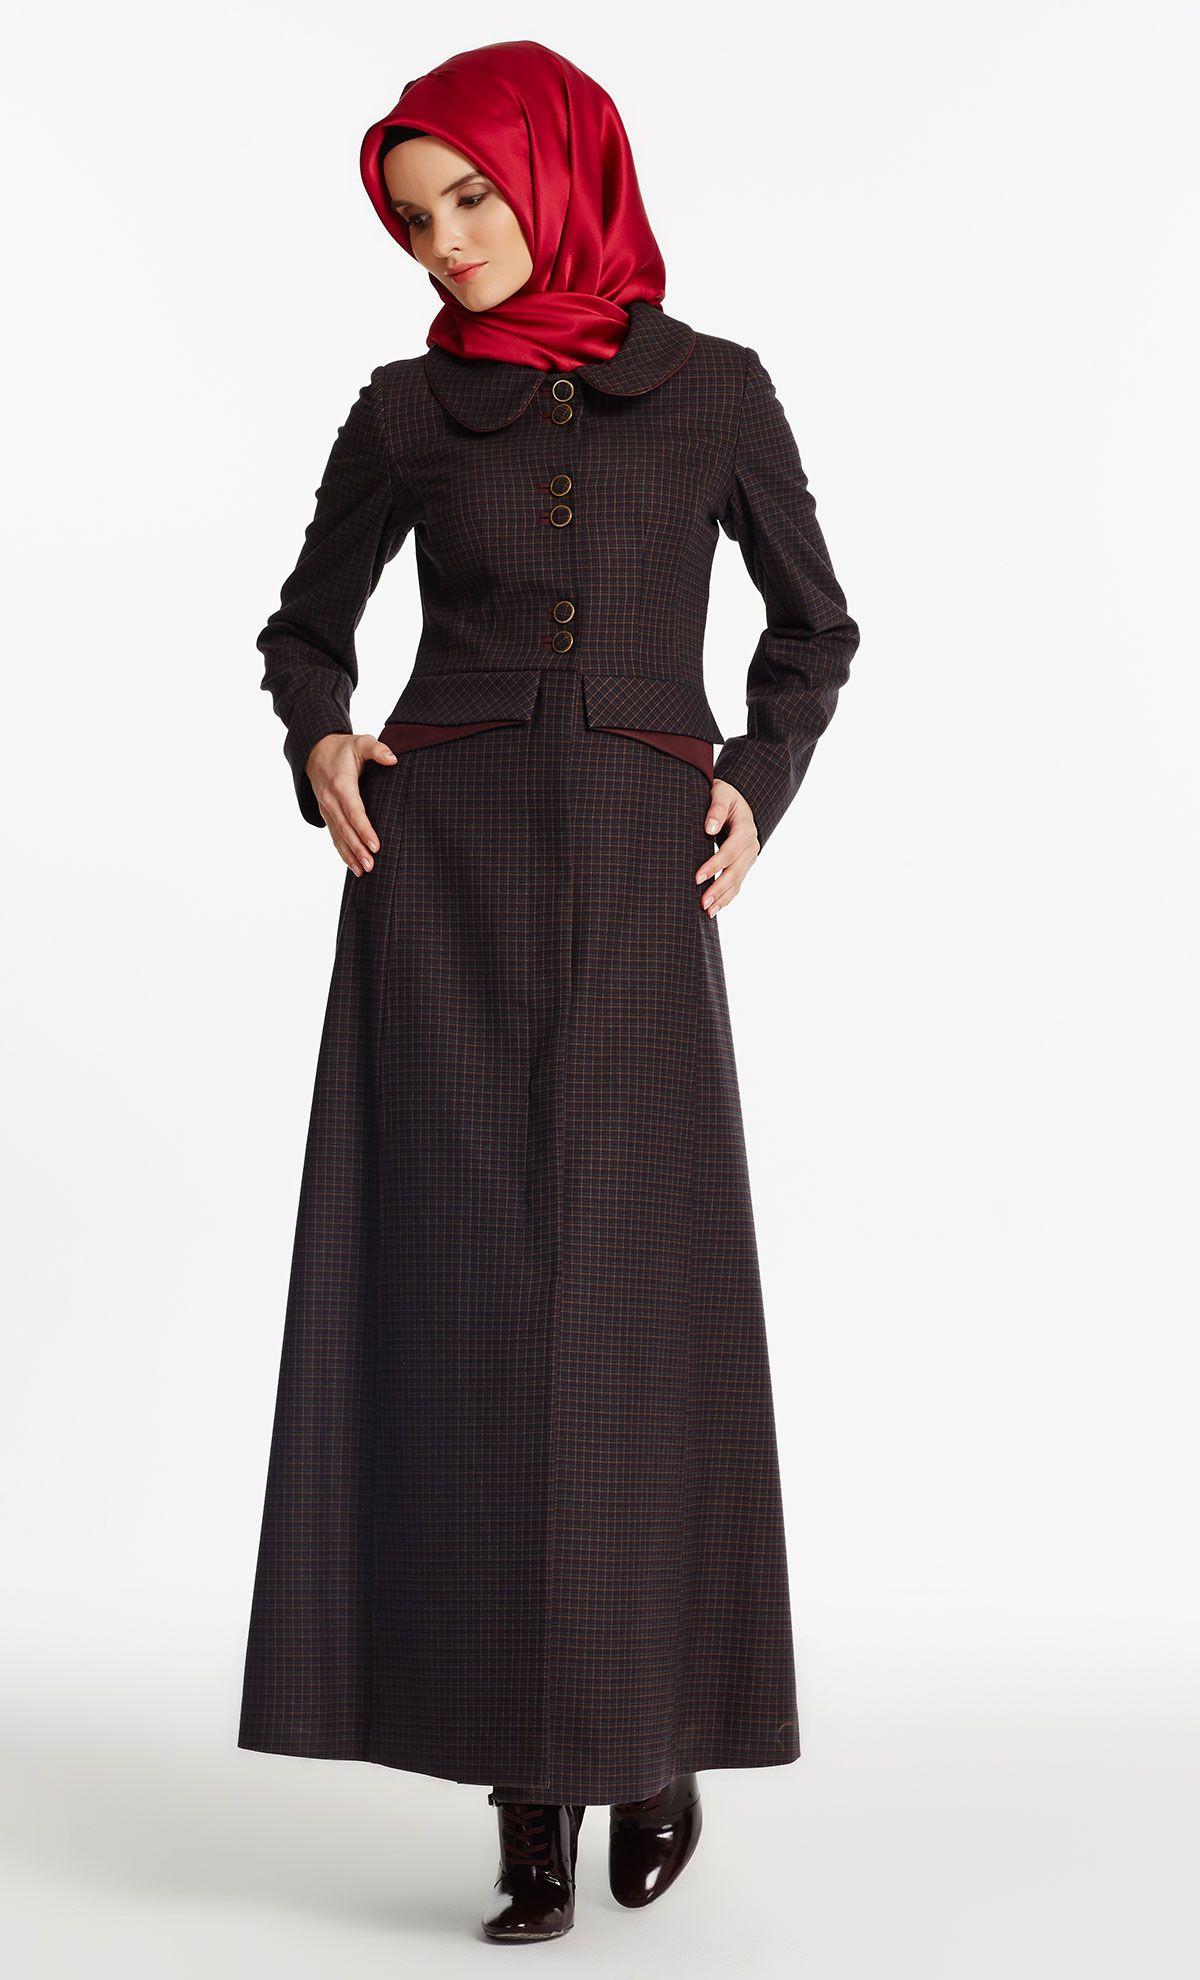 Tugba Store Tesettur Giyim Tesettur Elbise Pardesu Manto Online Alisveris Pakaian Hijab Desain